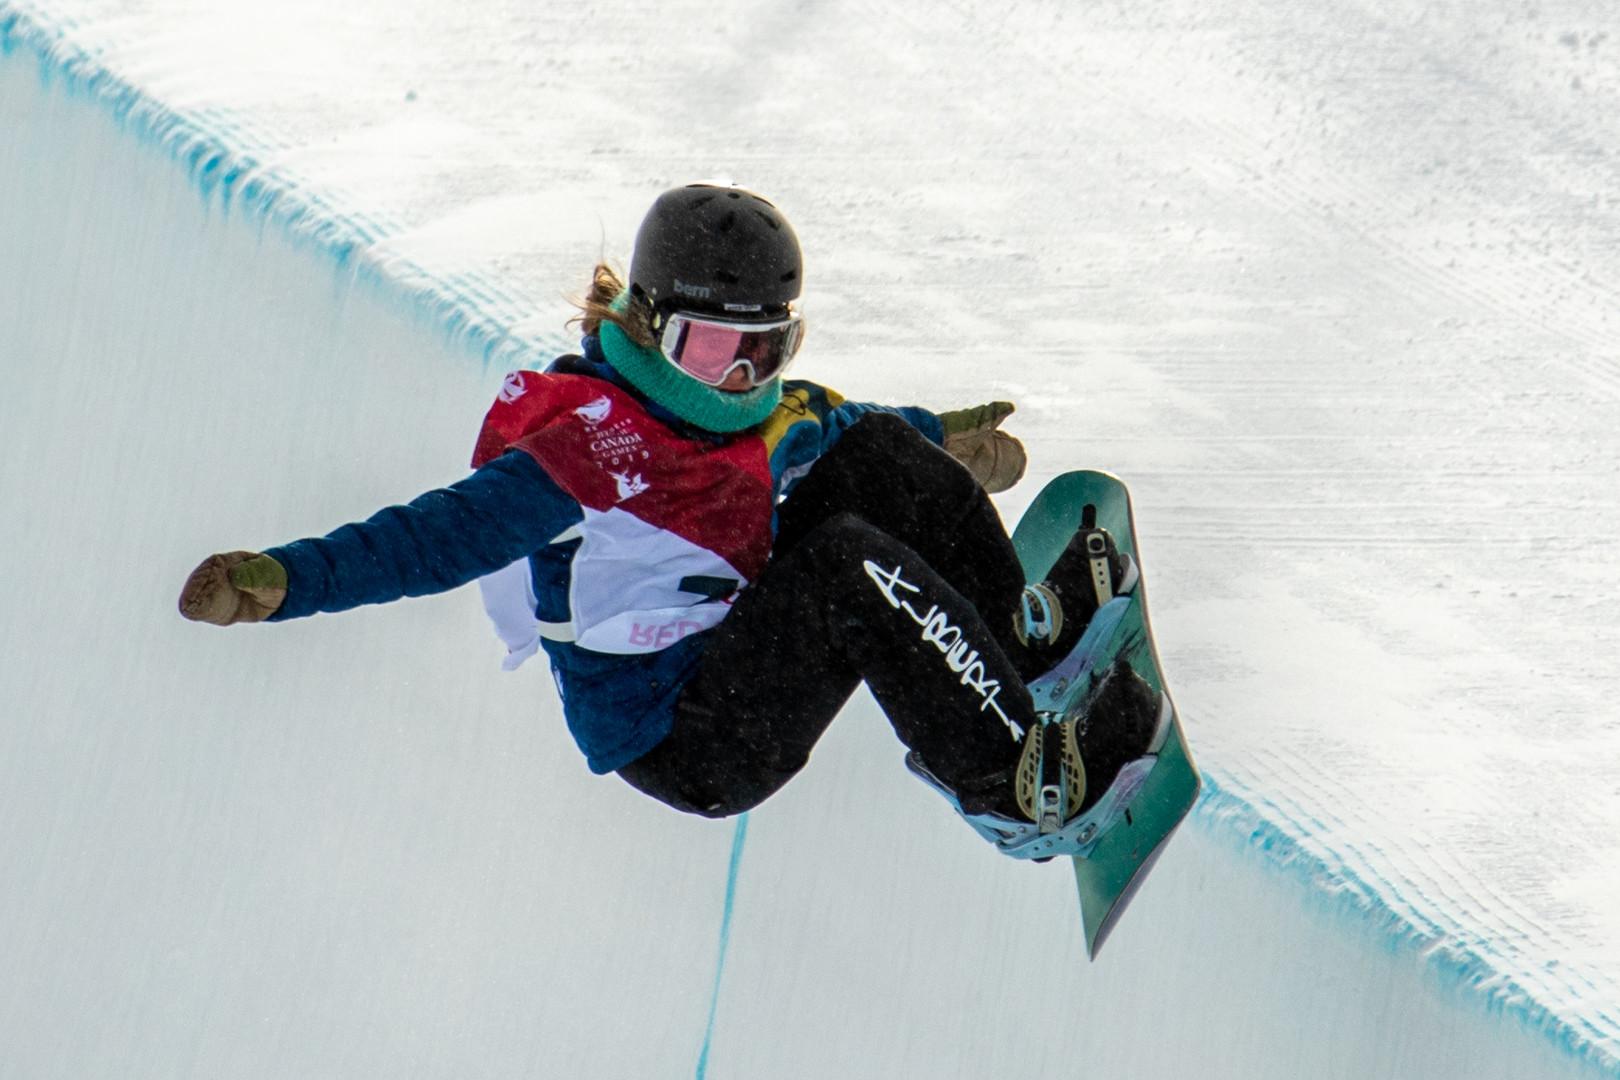 ShellyPriest_03012019_SnowboardingHalfpi